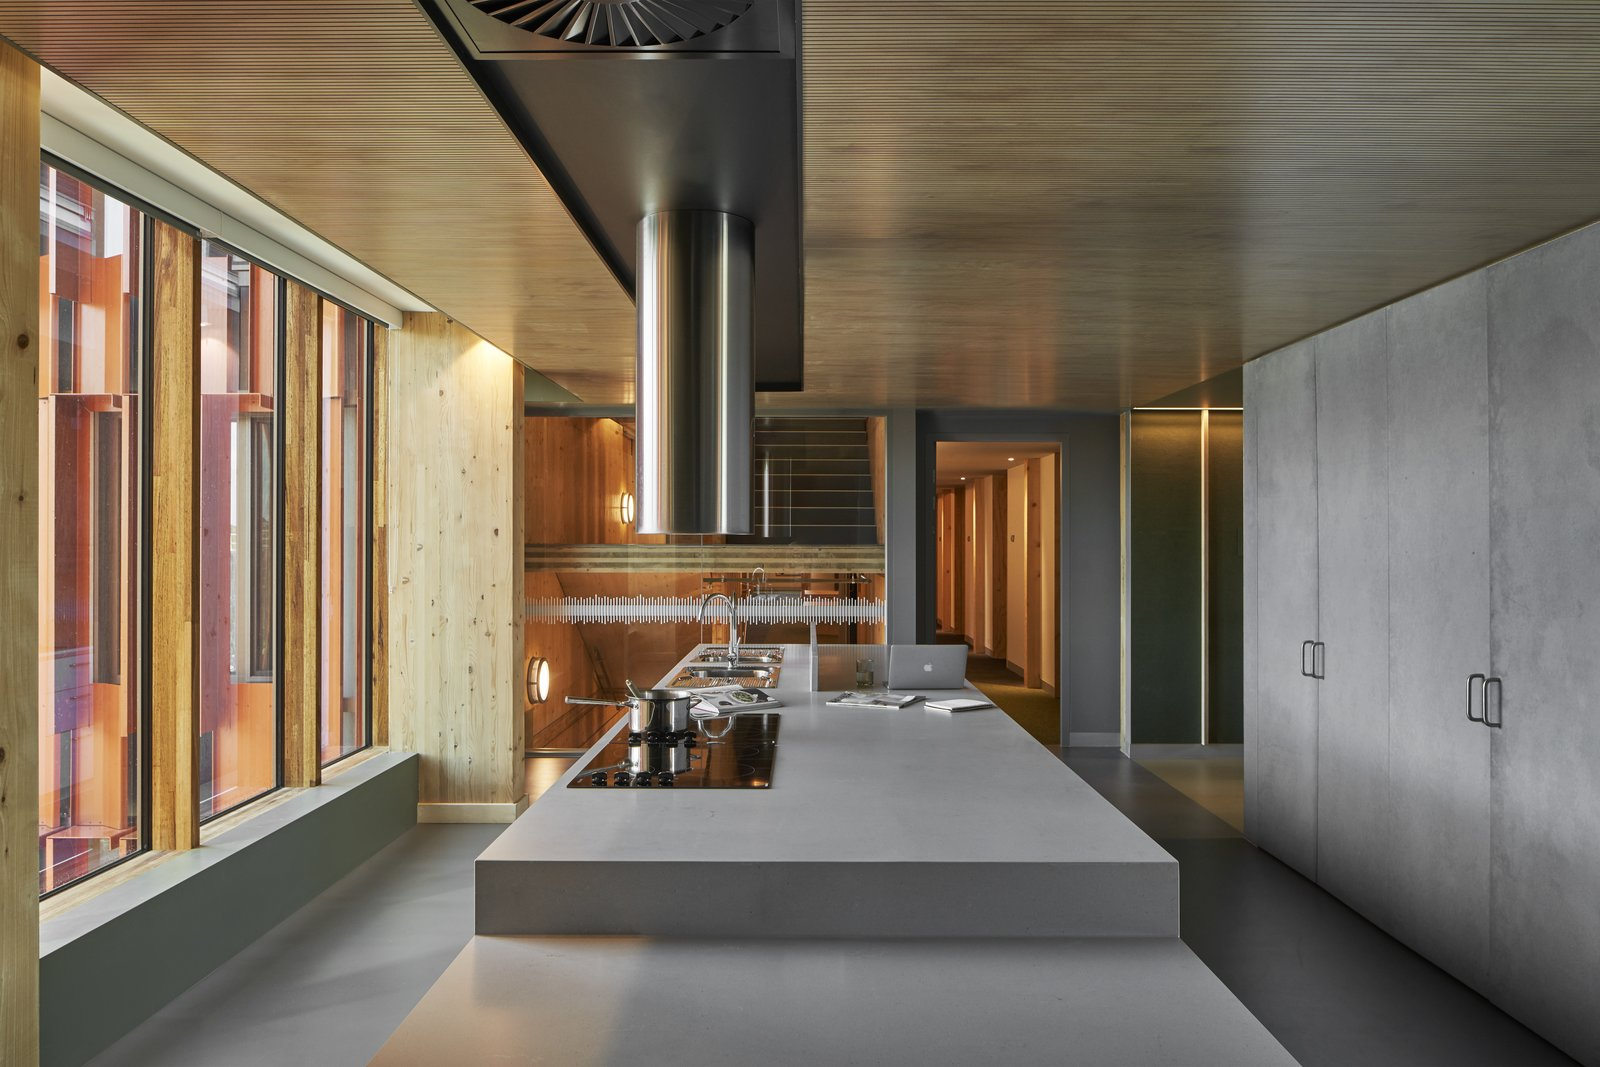 Gillies Hall at Monash University by JCB Architects common kitchen